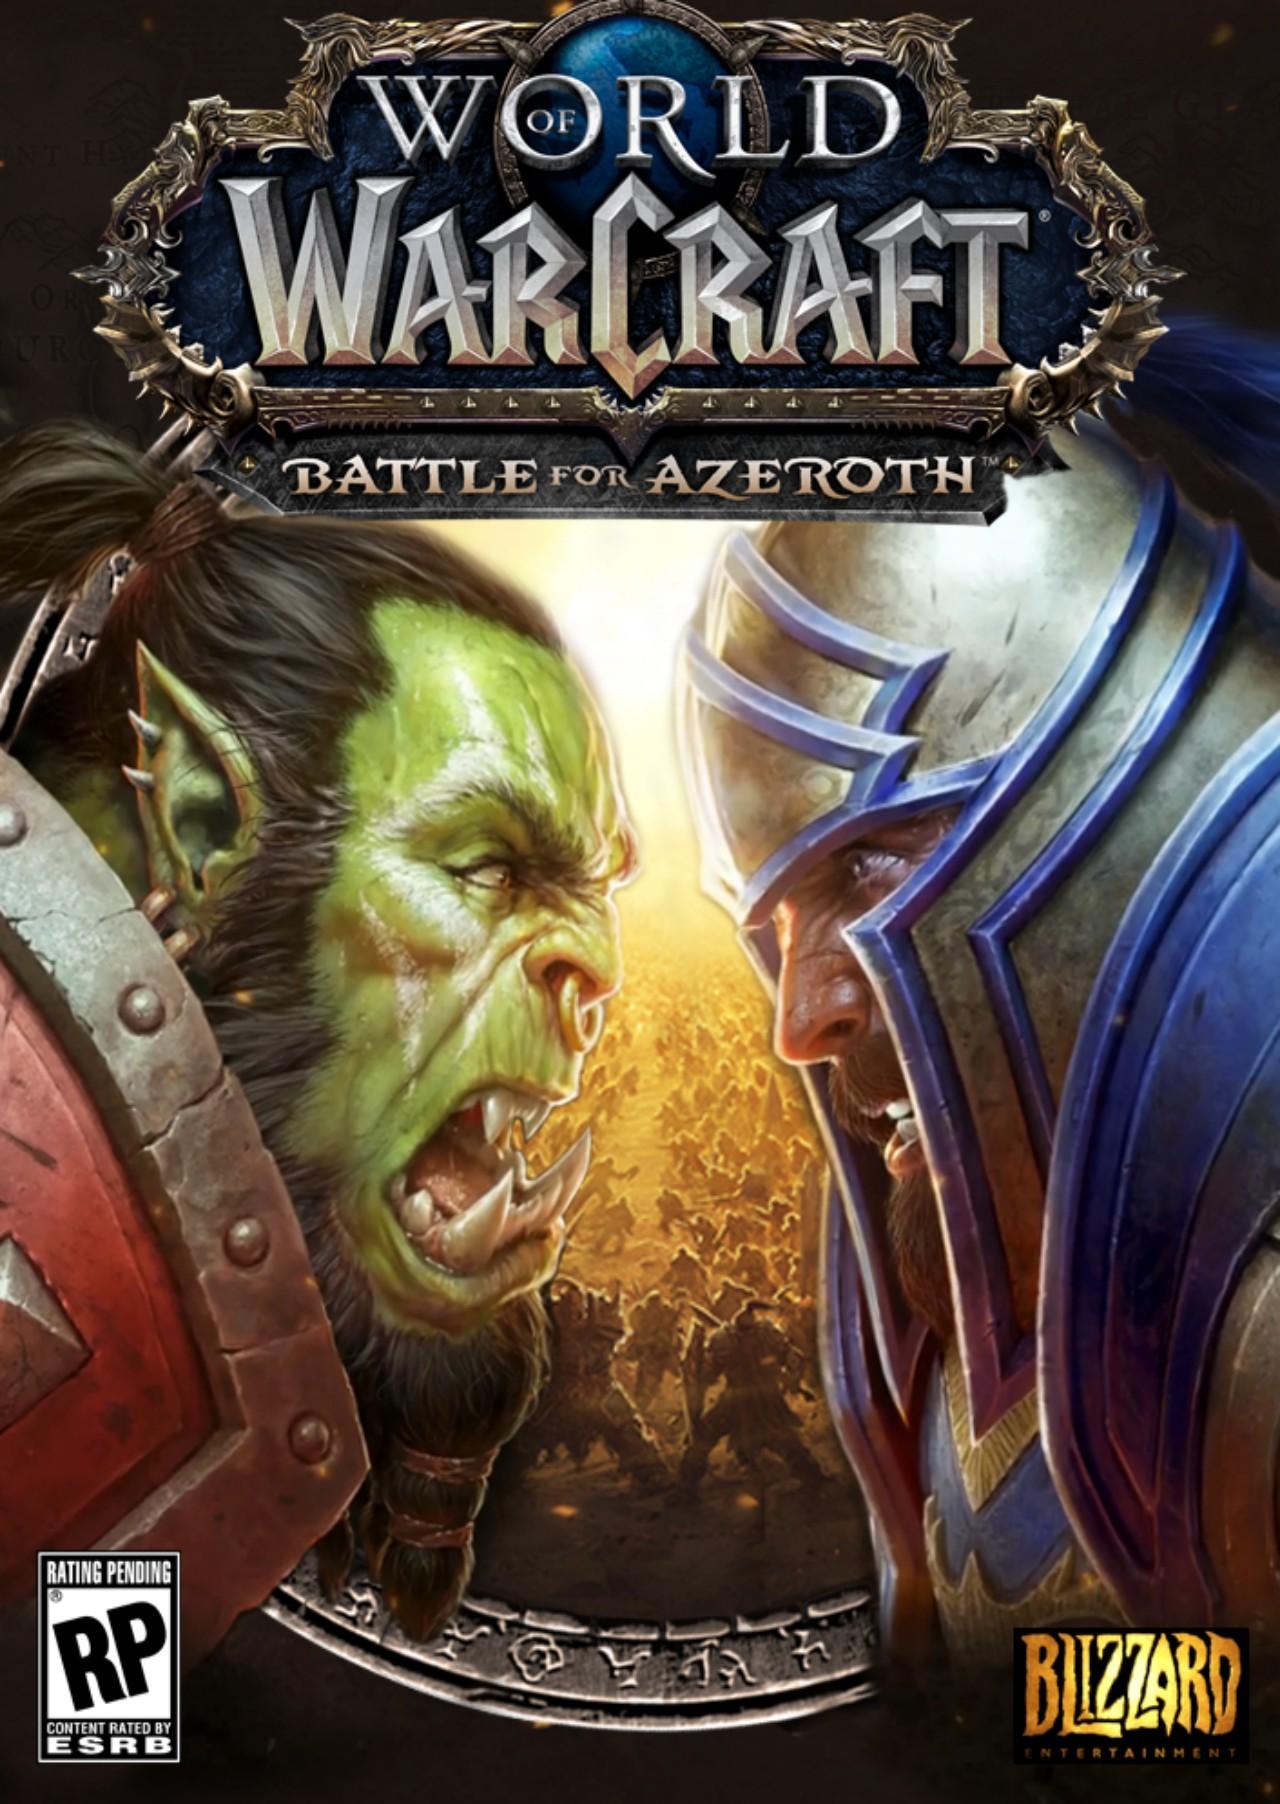 world-of-warcraft-battle-for-azeroth.jpg